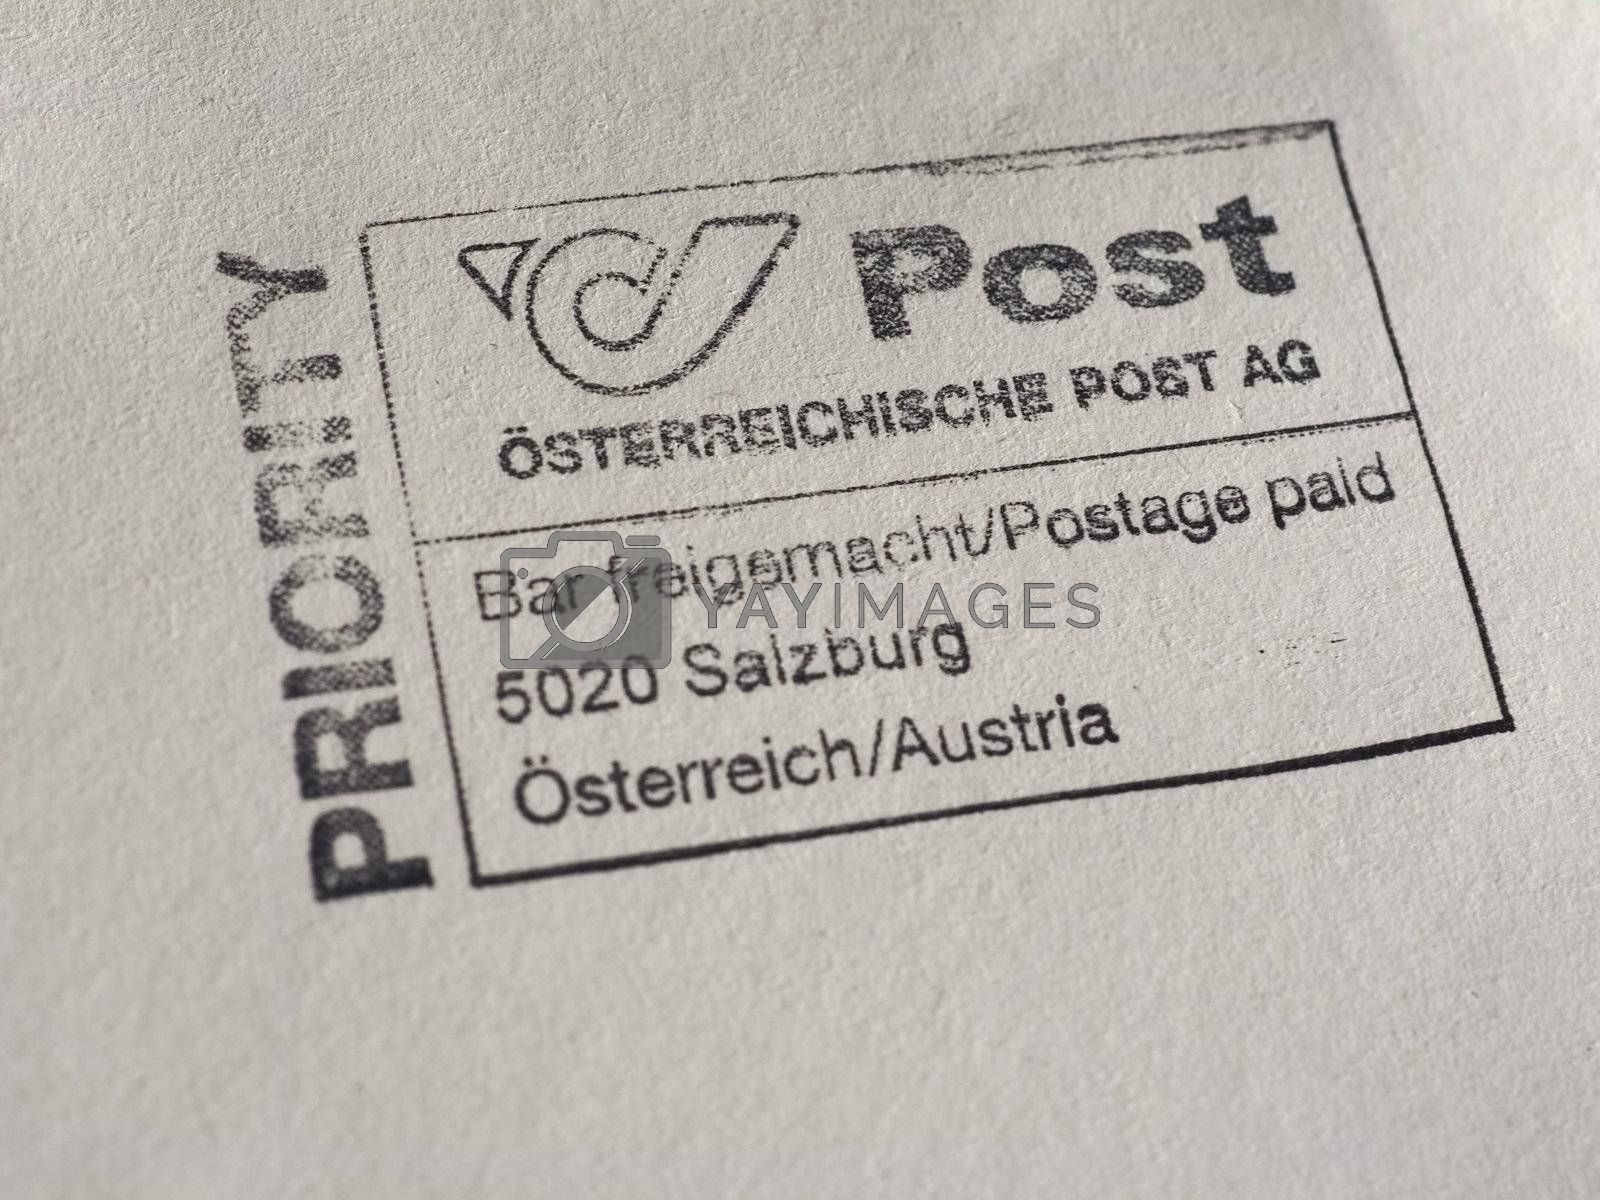 WIEN, AUSTRIA - CIRCA JANUARY 2020: Austrian postage meter